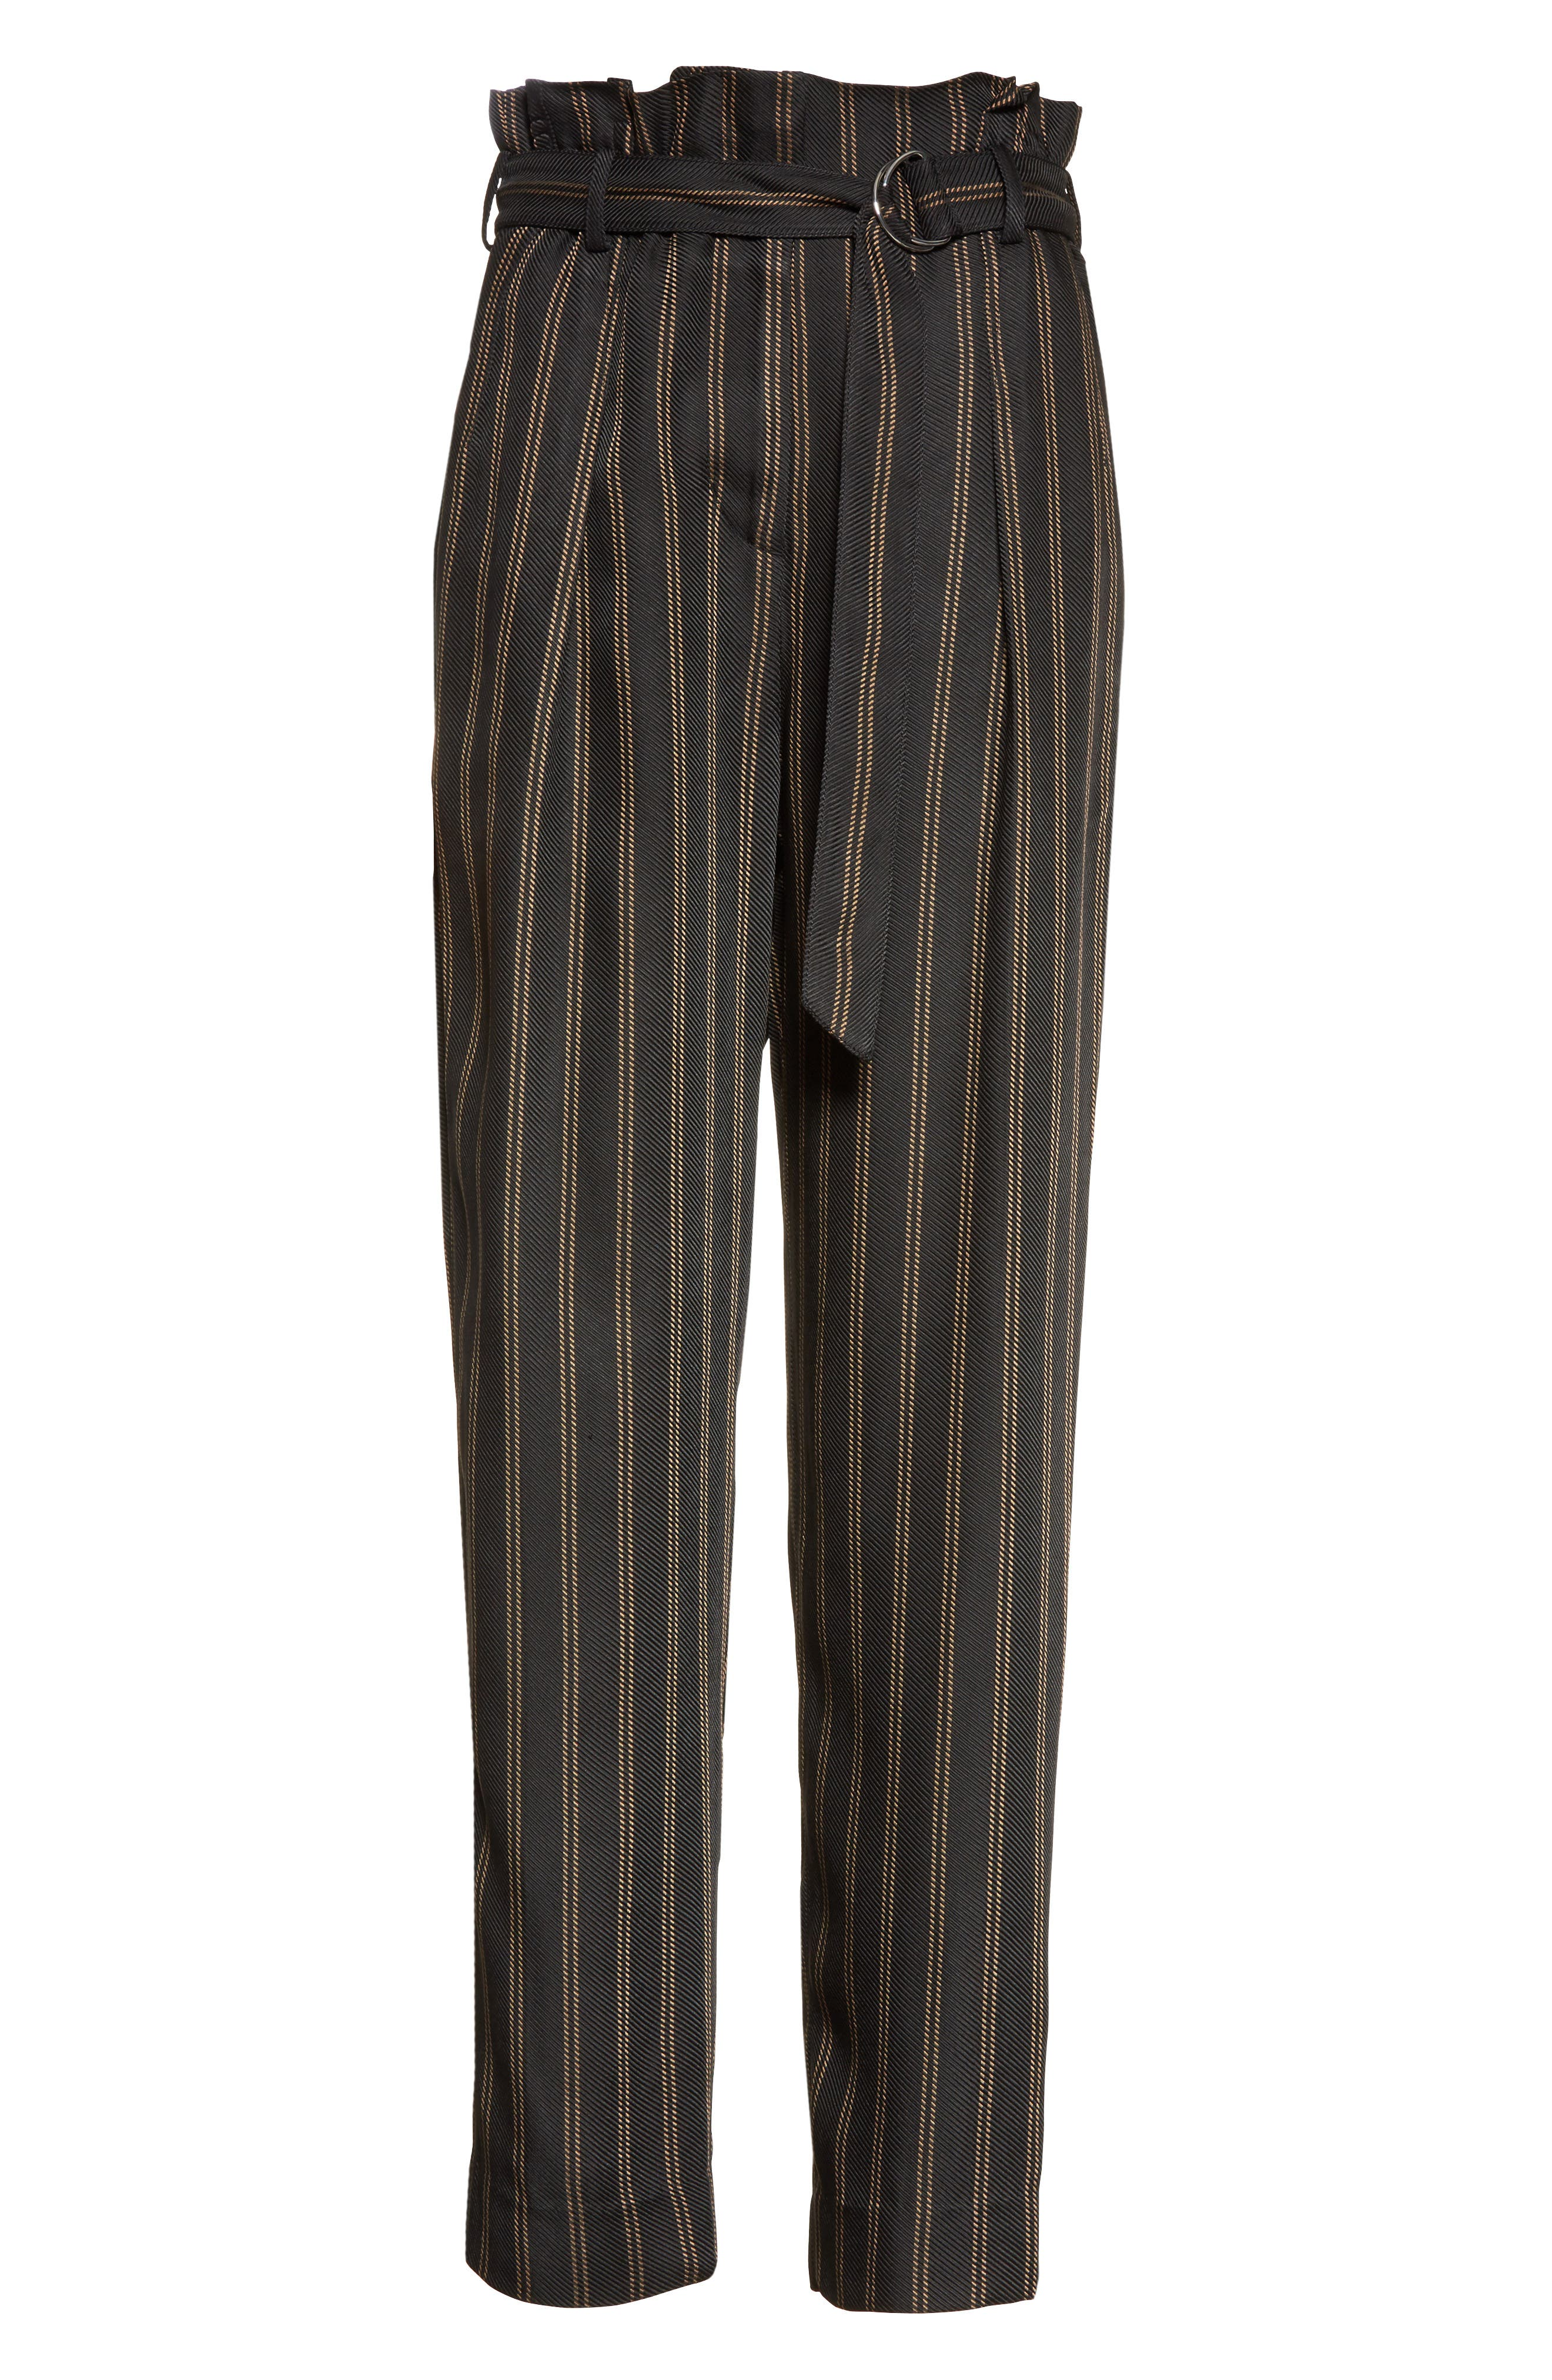 Belted Pleat Crop Pants,                             Alternate thumbnail 7, color,                             Black/ Tan